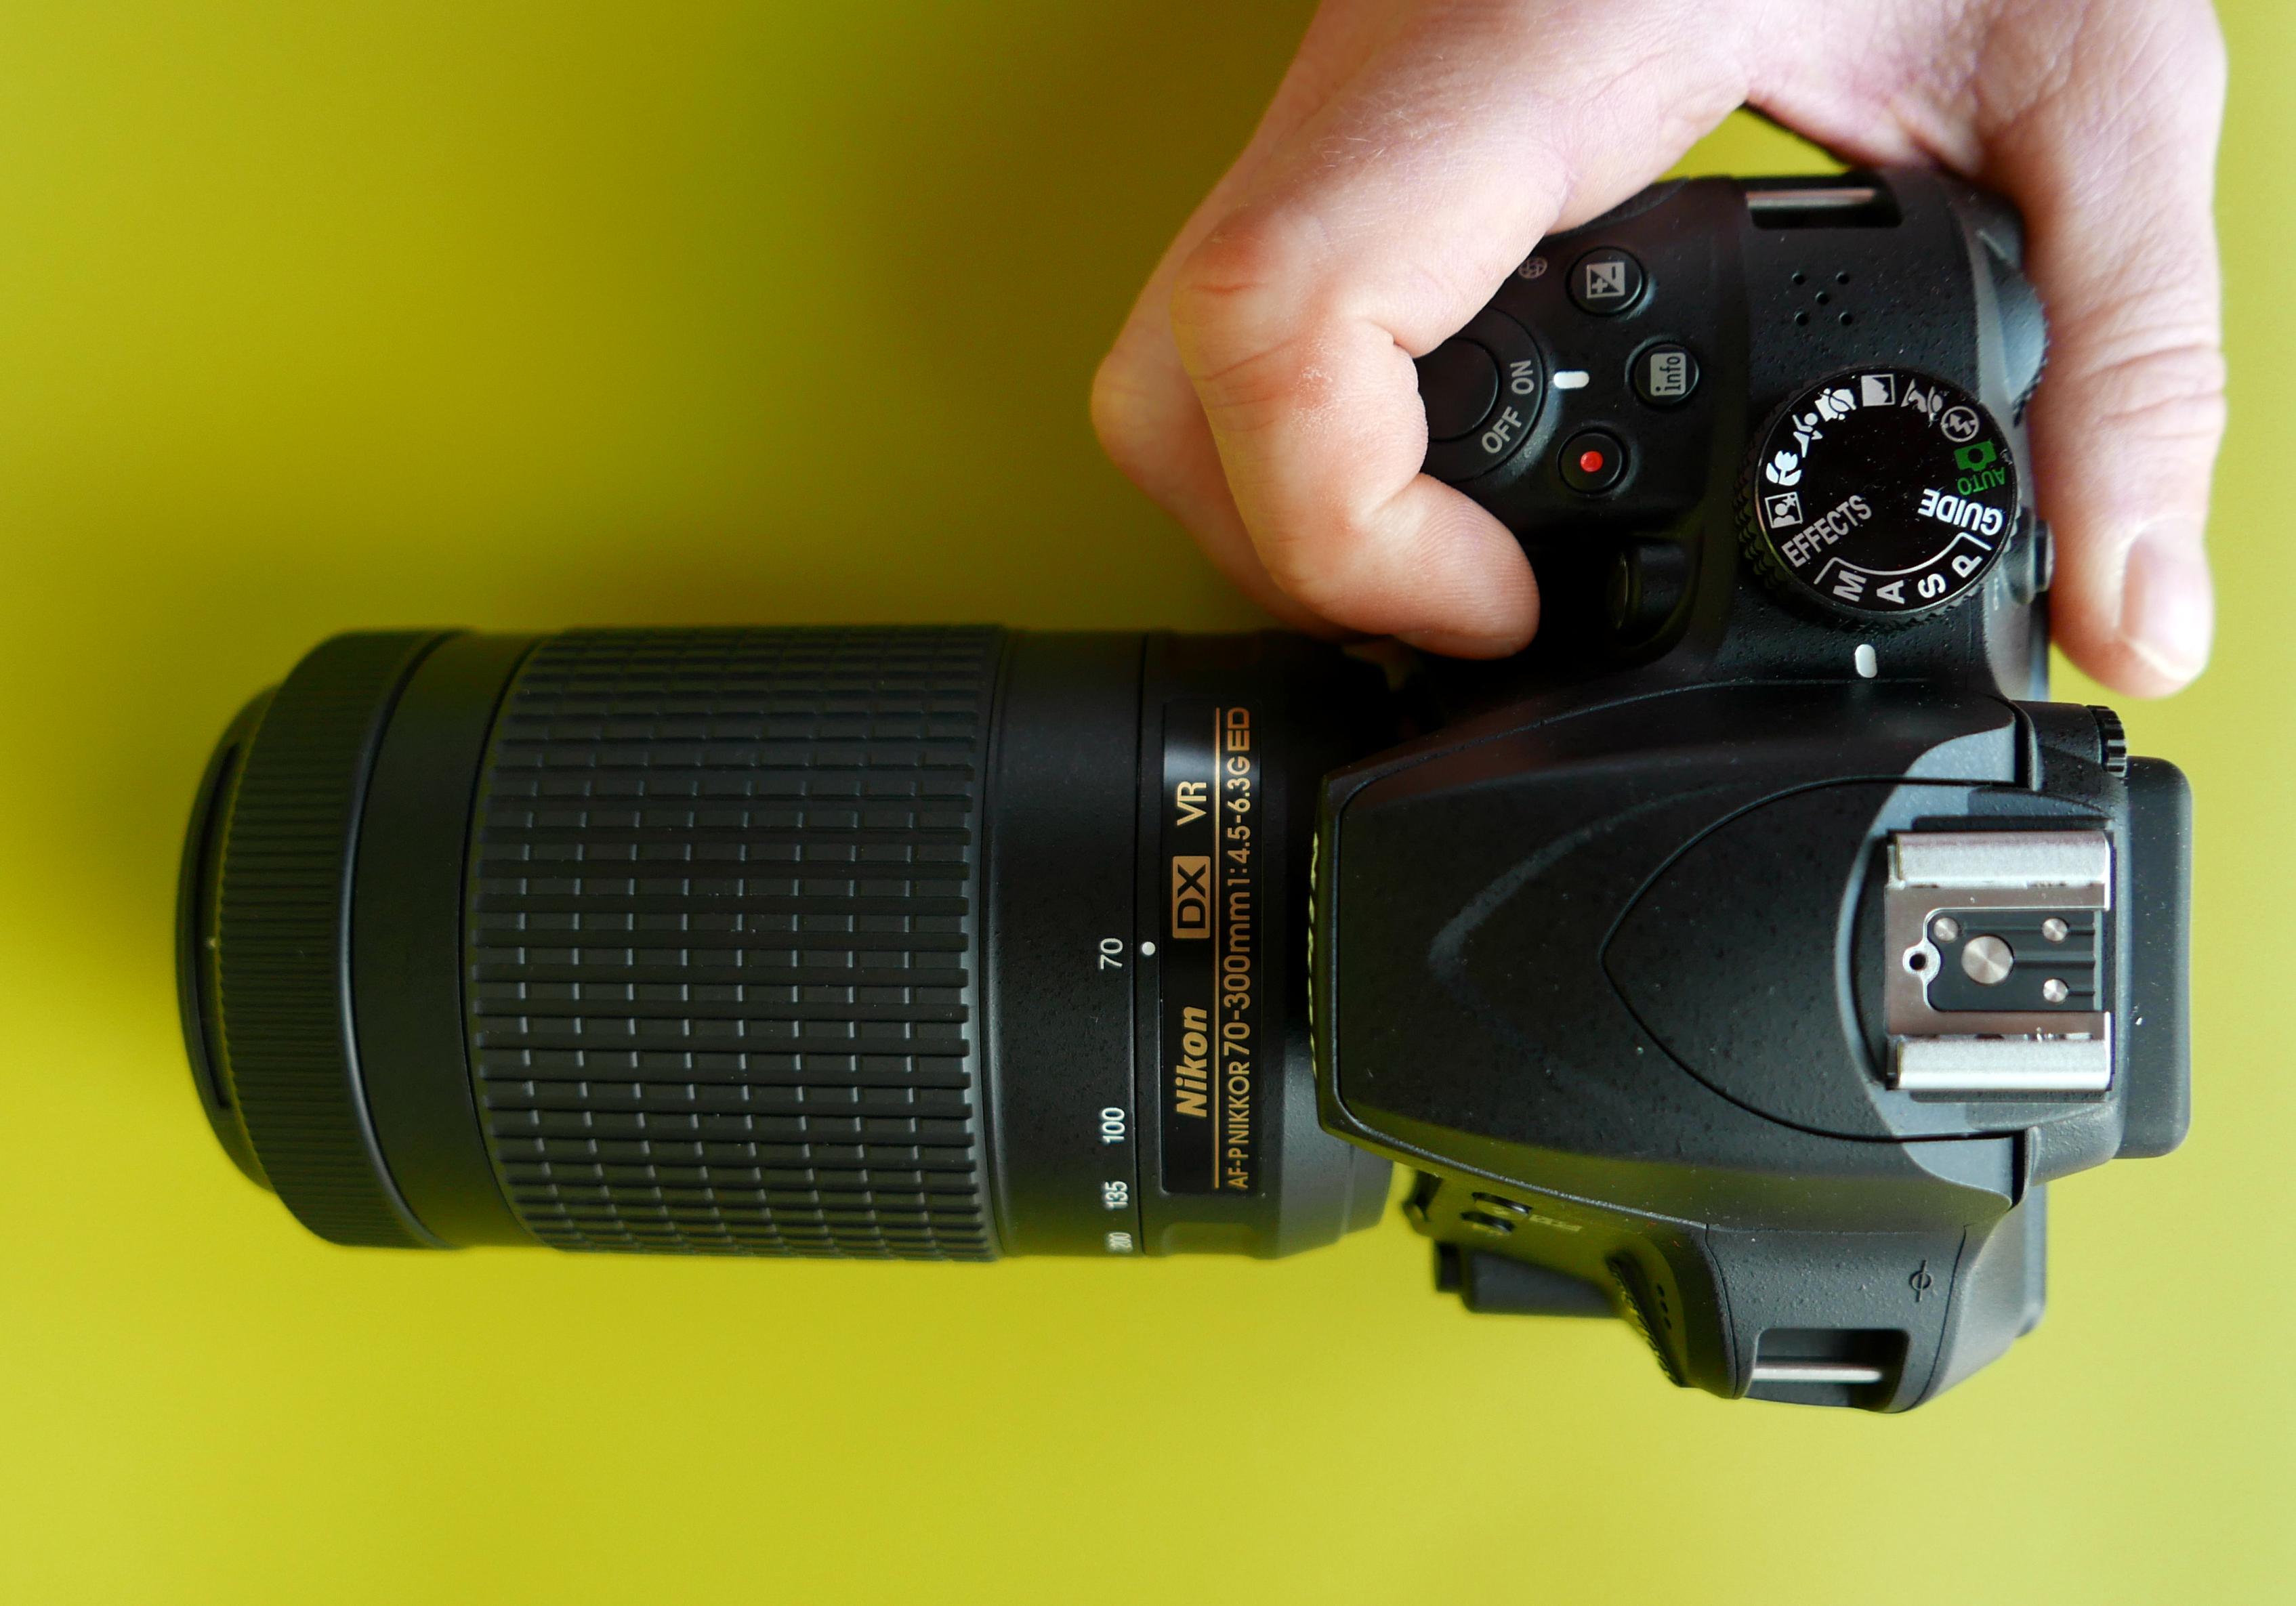 (Foto: Lasse Svendsen) D3400 er et lite kamera, men det ligger ikke så verst i hånden, selv med Nikons 70-300mm zoom.